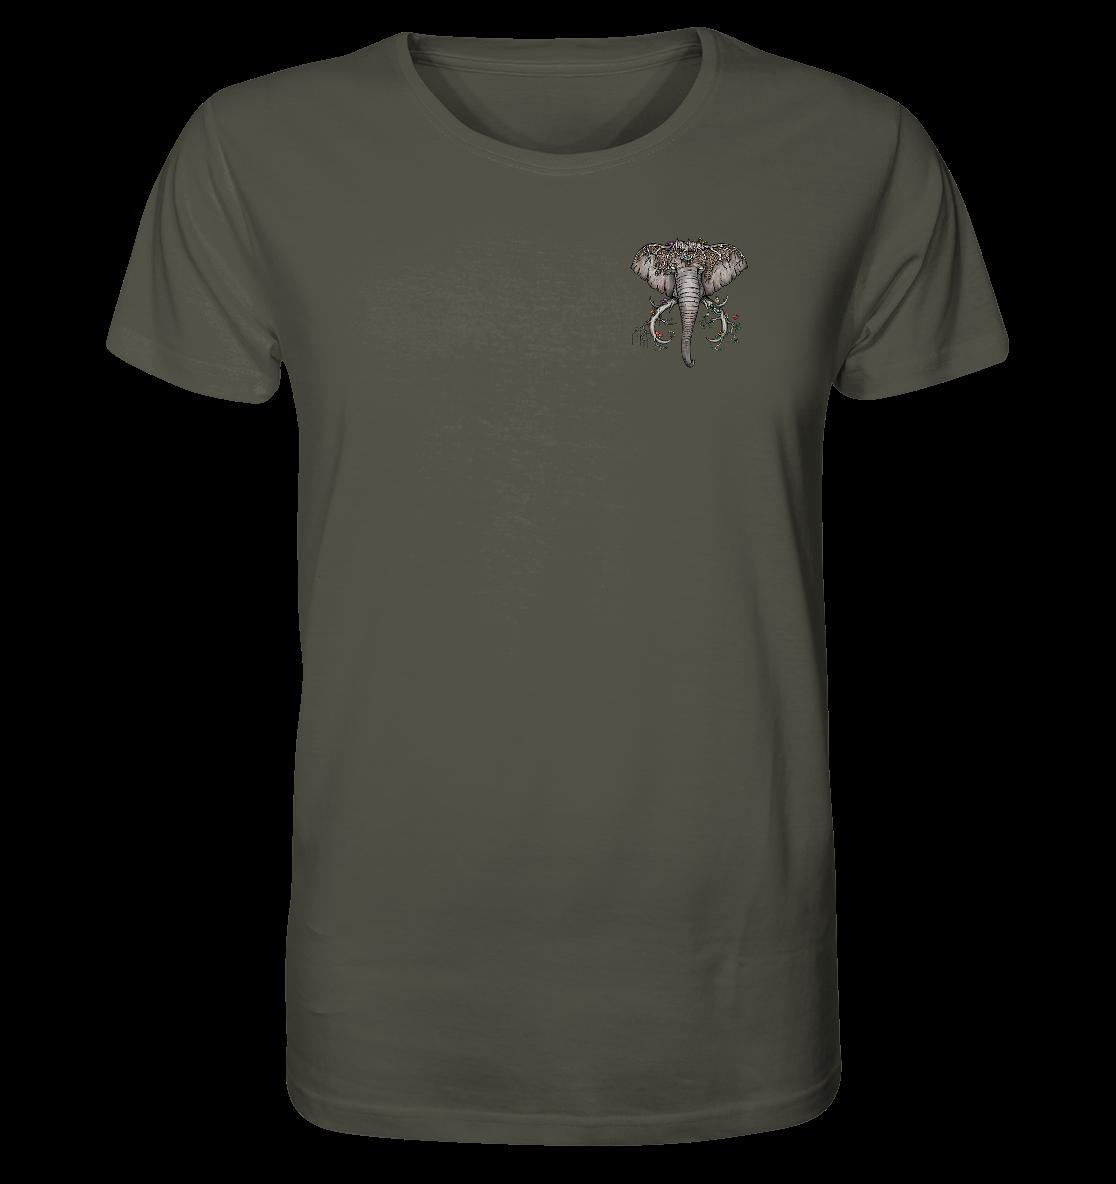 front-organic-shirt-545348-1116x-2.png